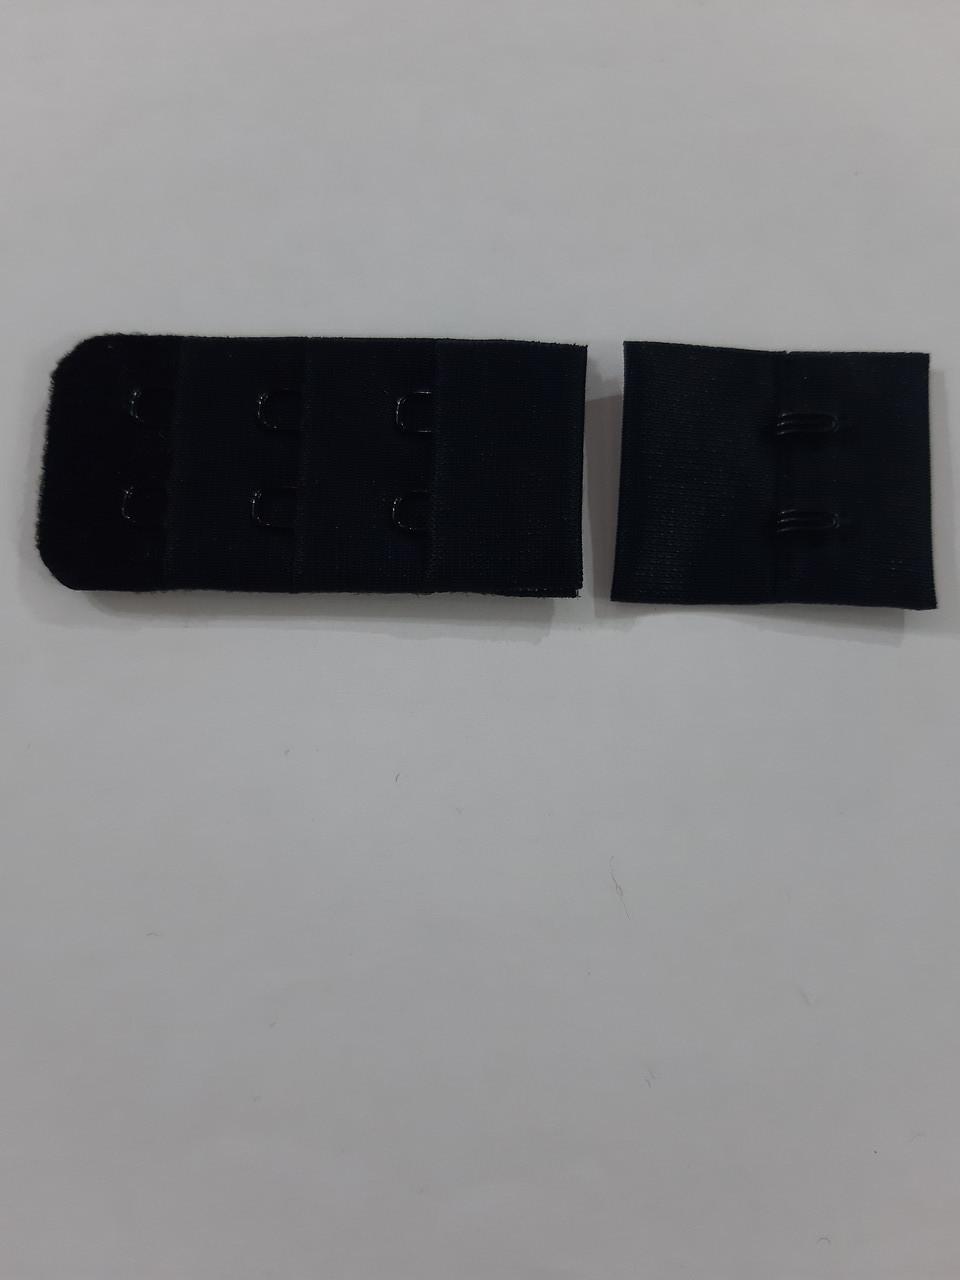 Застібка для бюстгальтера на 2 гачка 3 ряди петель 25мм кол чорний